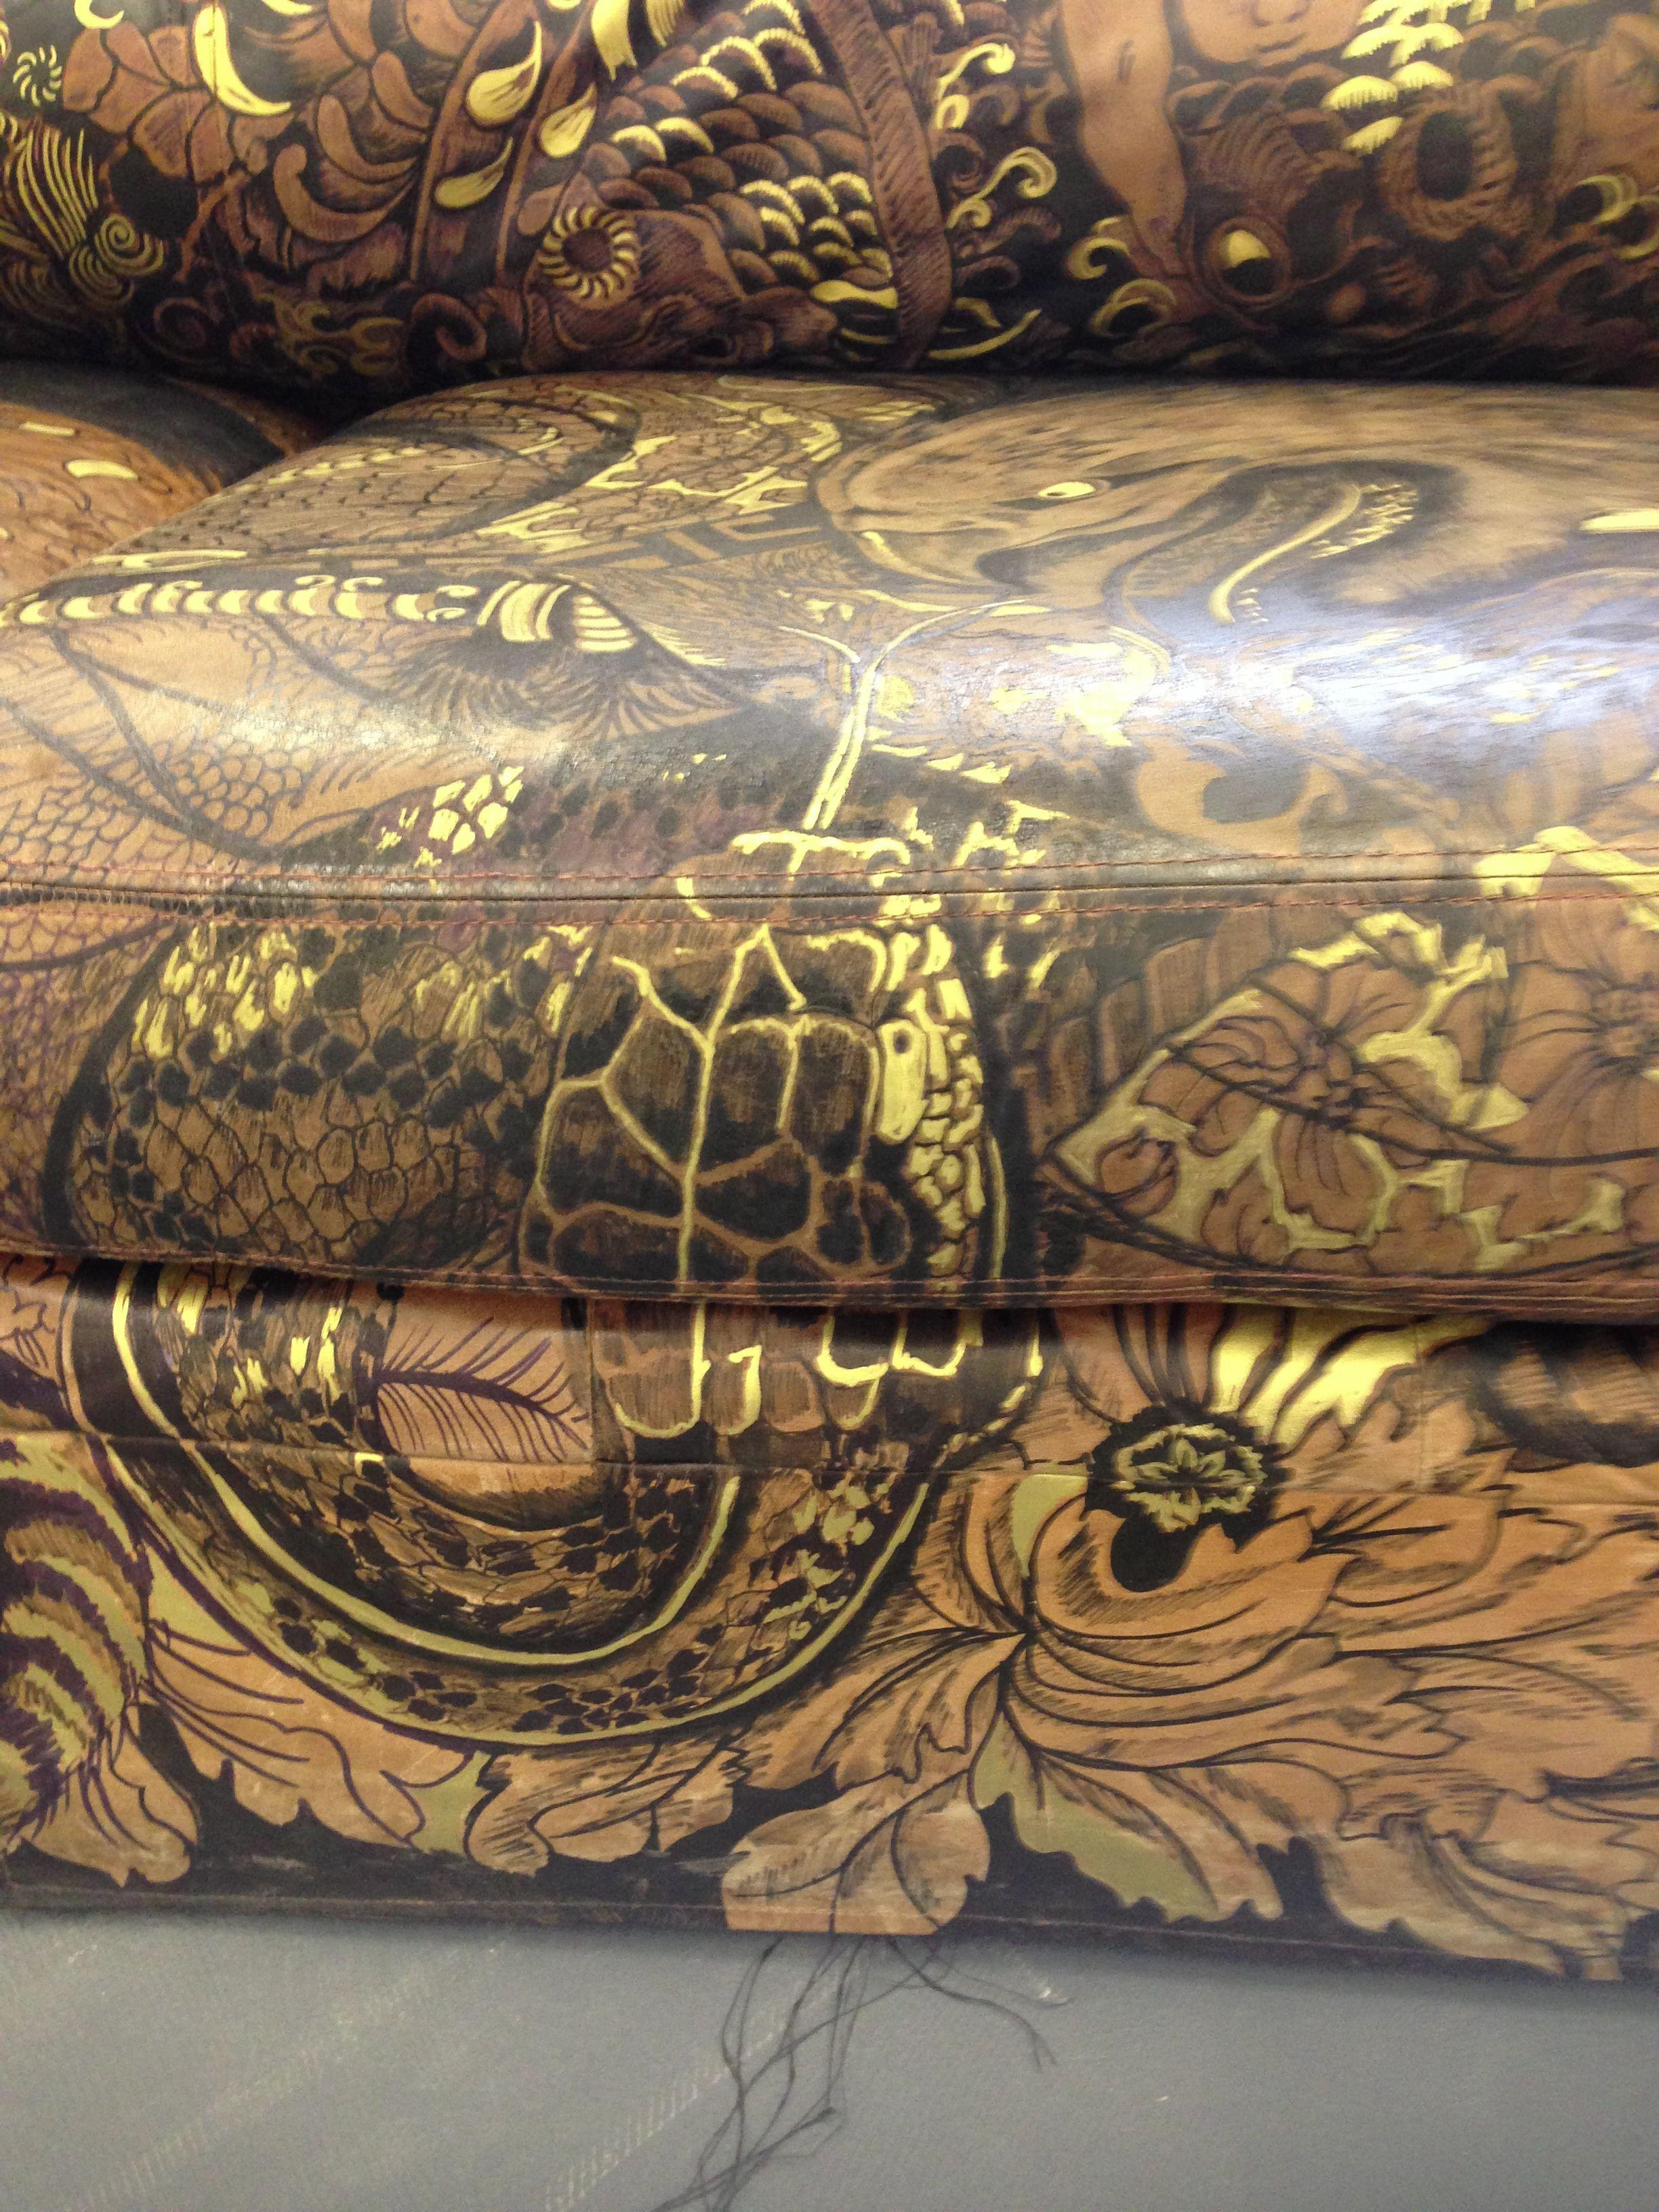 Detail of leather sofa handpaintrd based on japanese